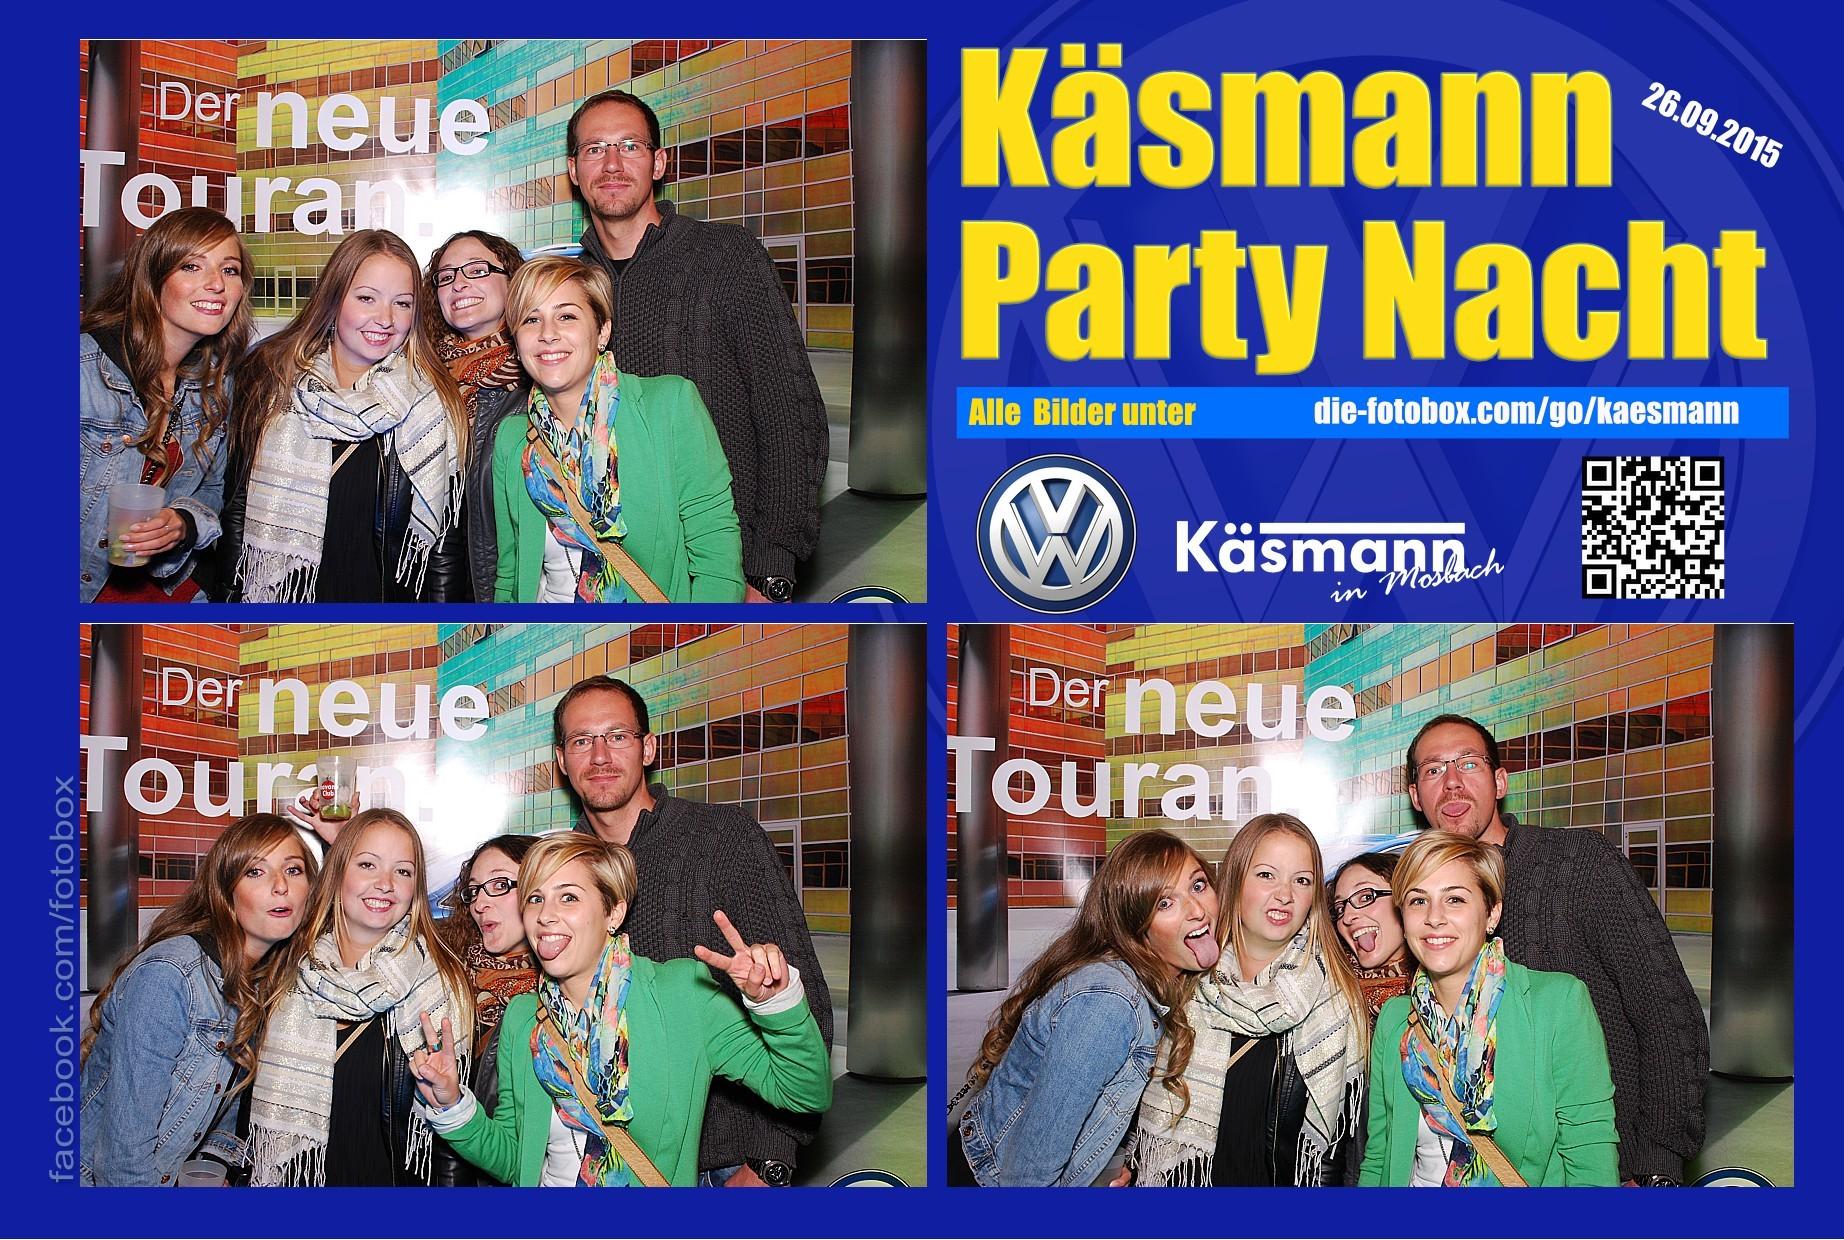 Käsmannparty 2015 - www.die-fotobox.com 01390